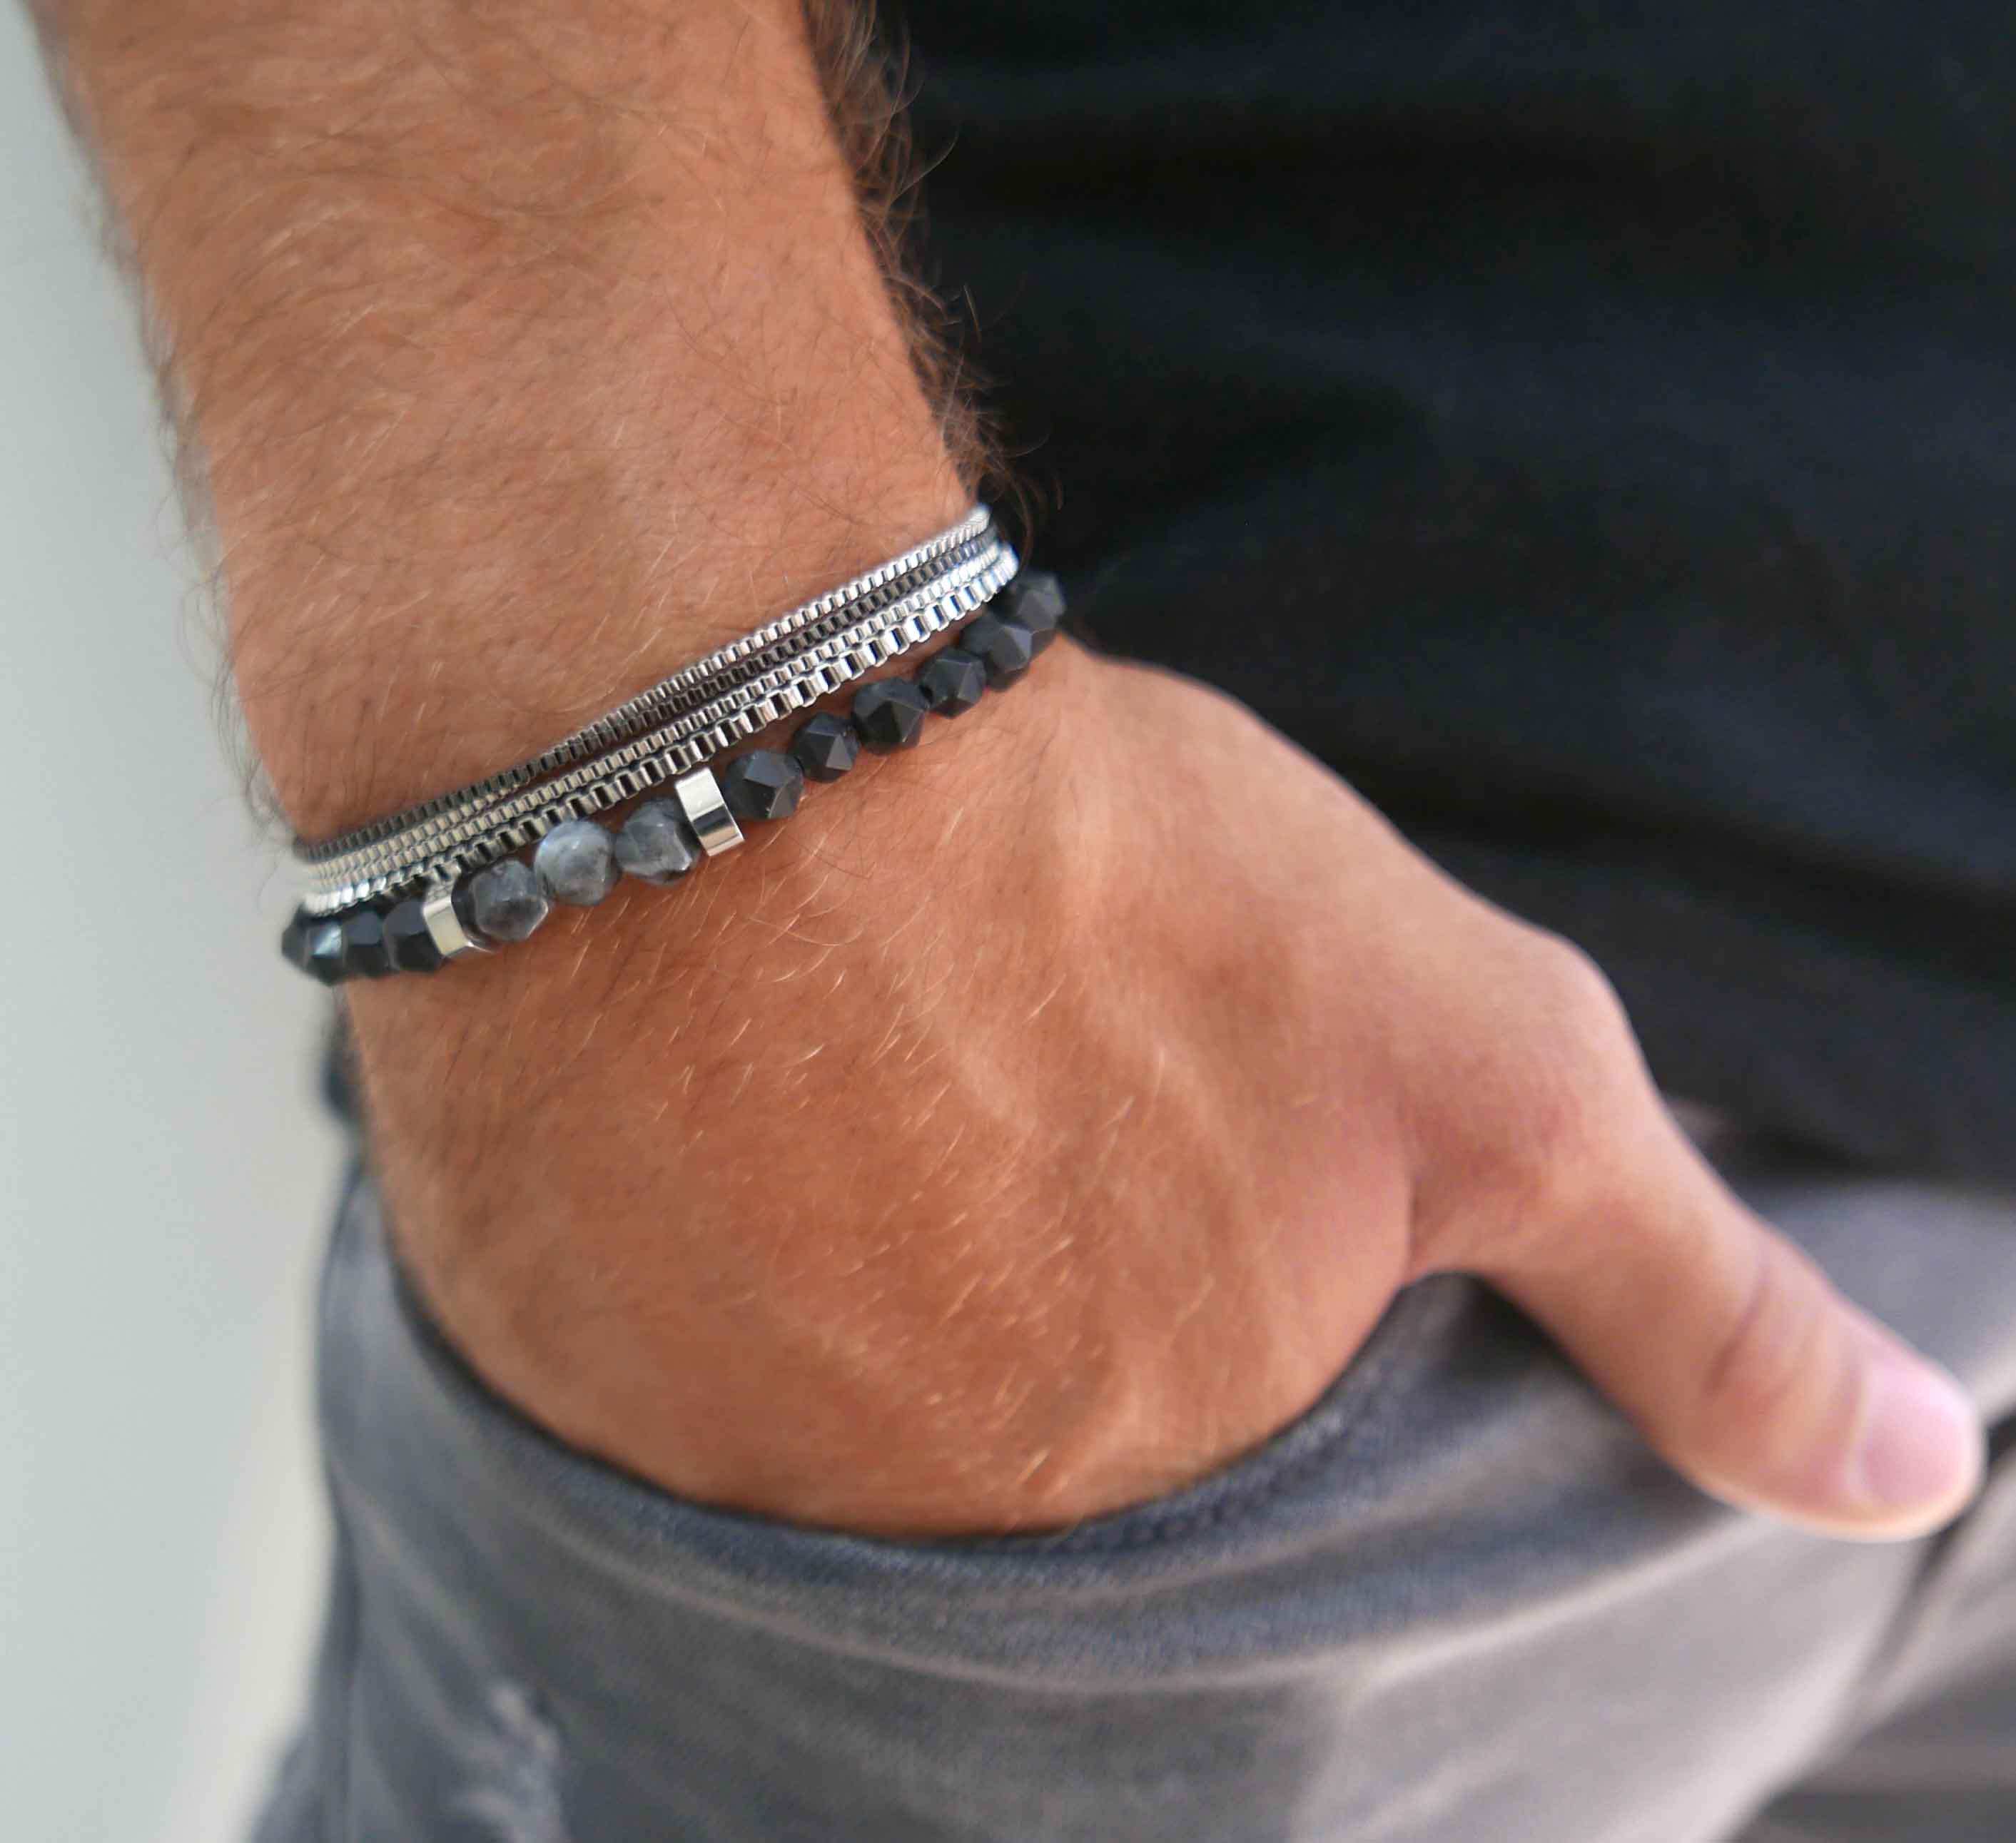 Men's Leather Bracelets Buying Guide - Dapper Dude